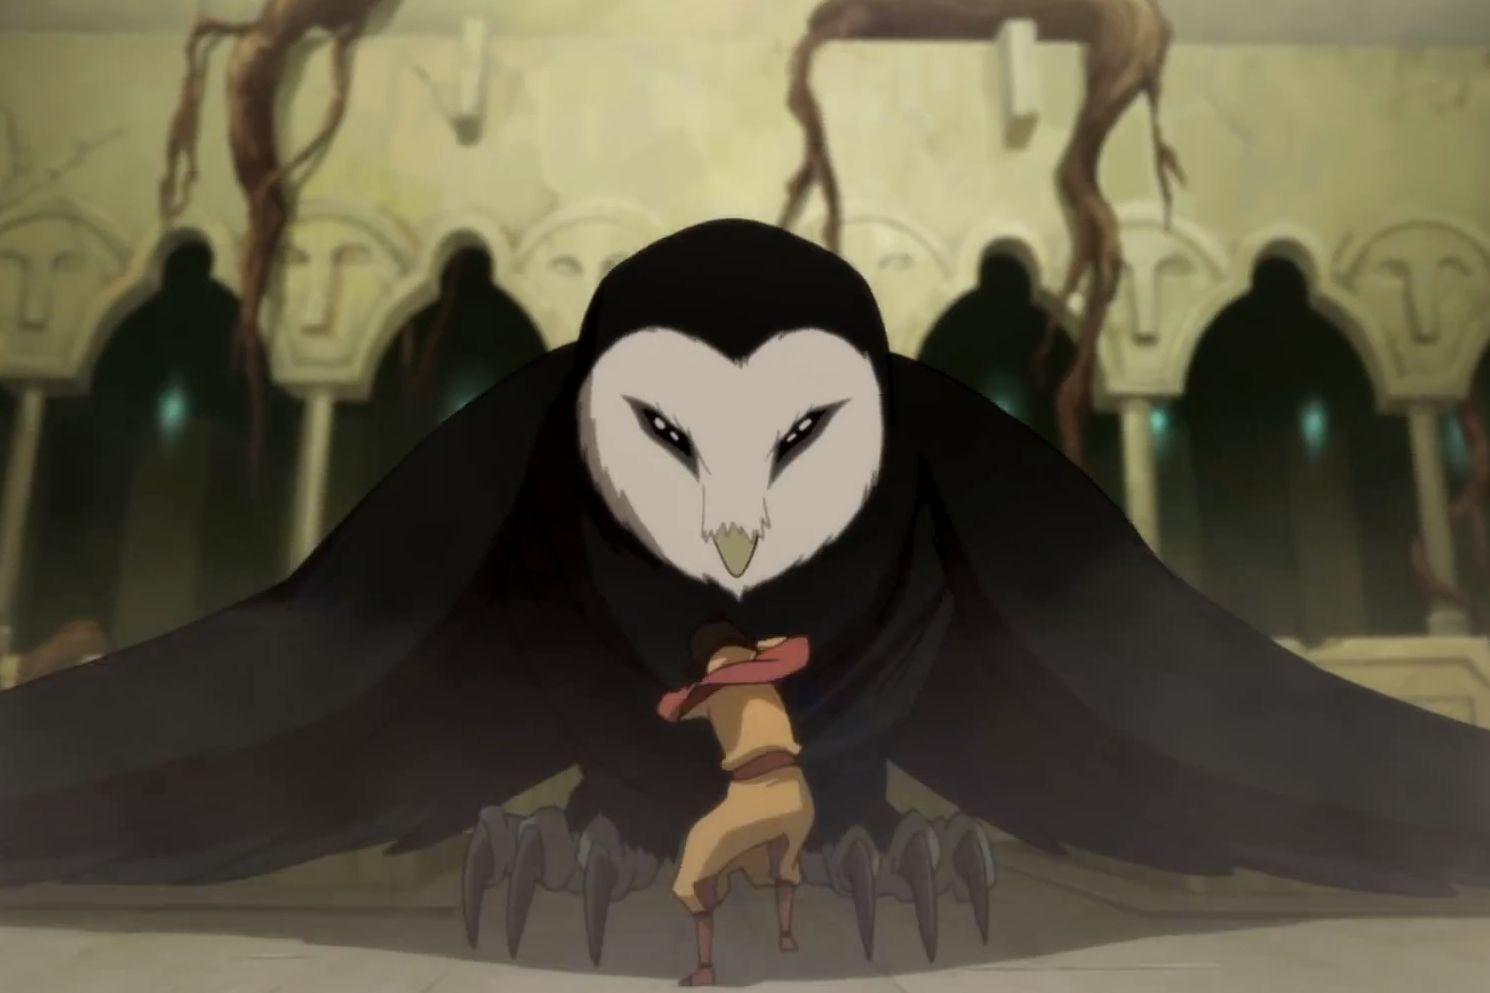 avatar the last airbender owl - Google Search | Horror Genre